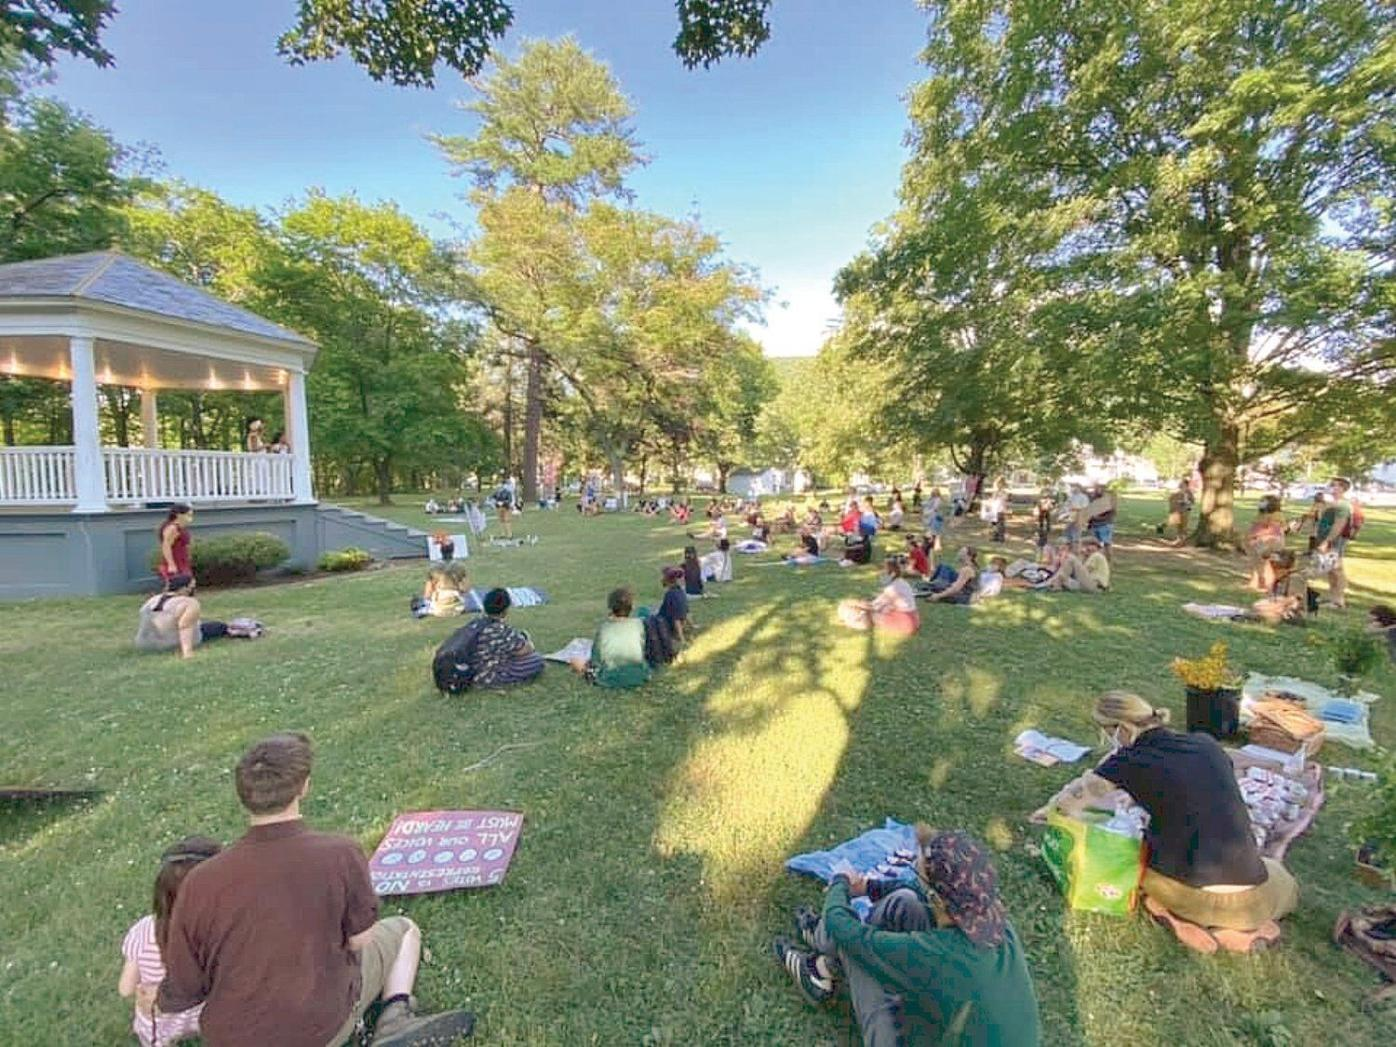 Social justice demonstration helps community healing